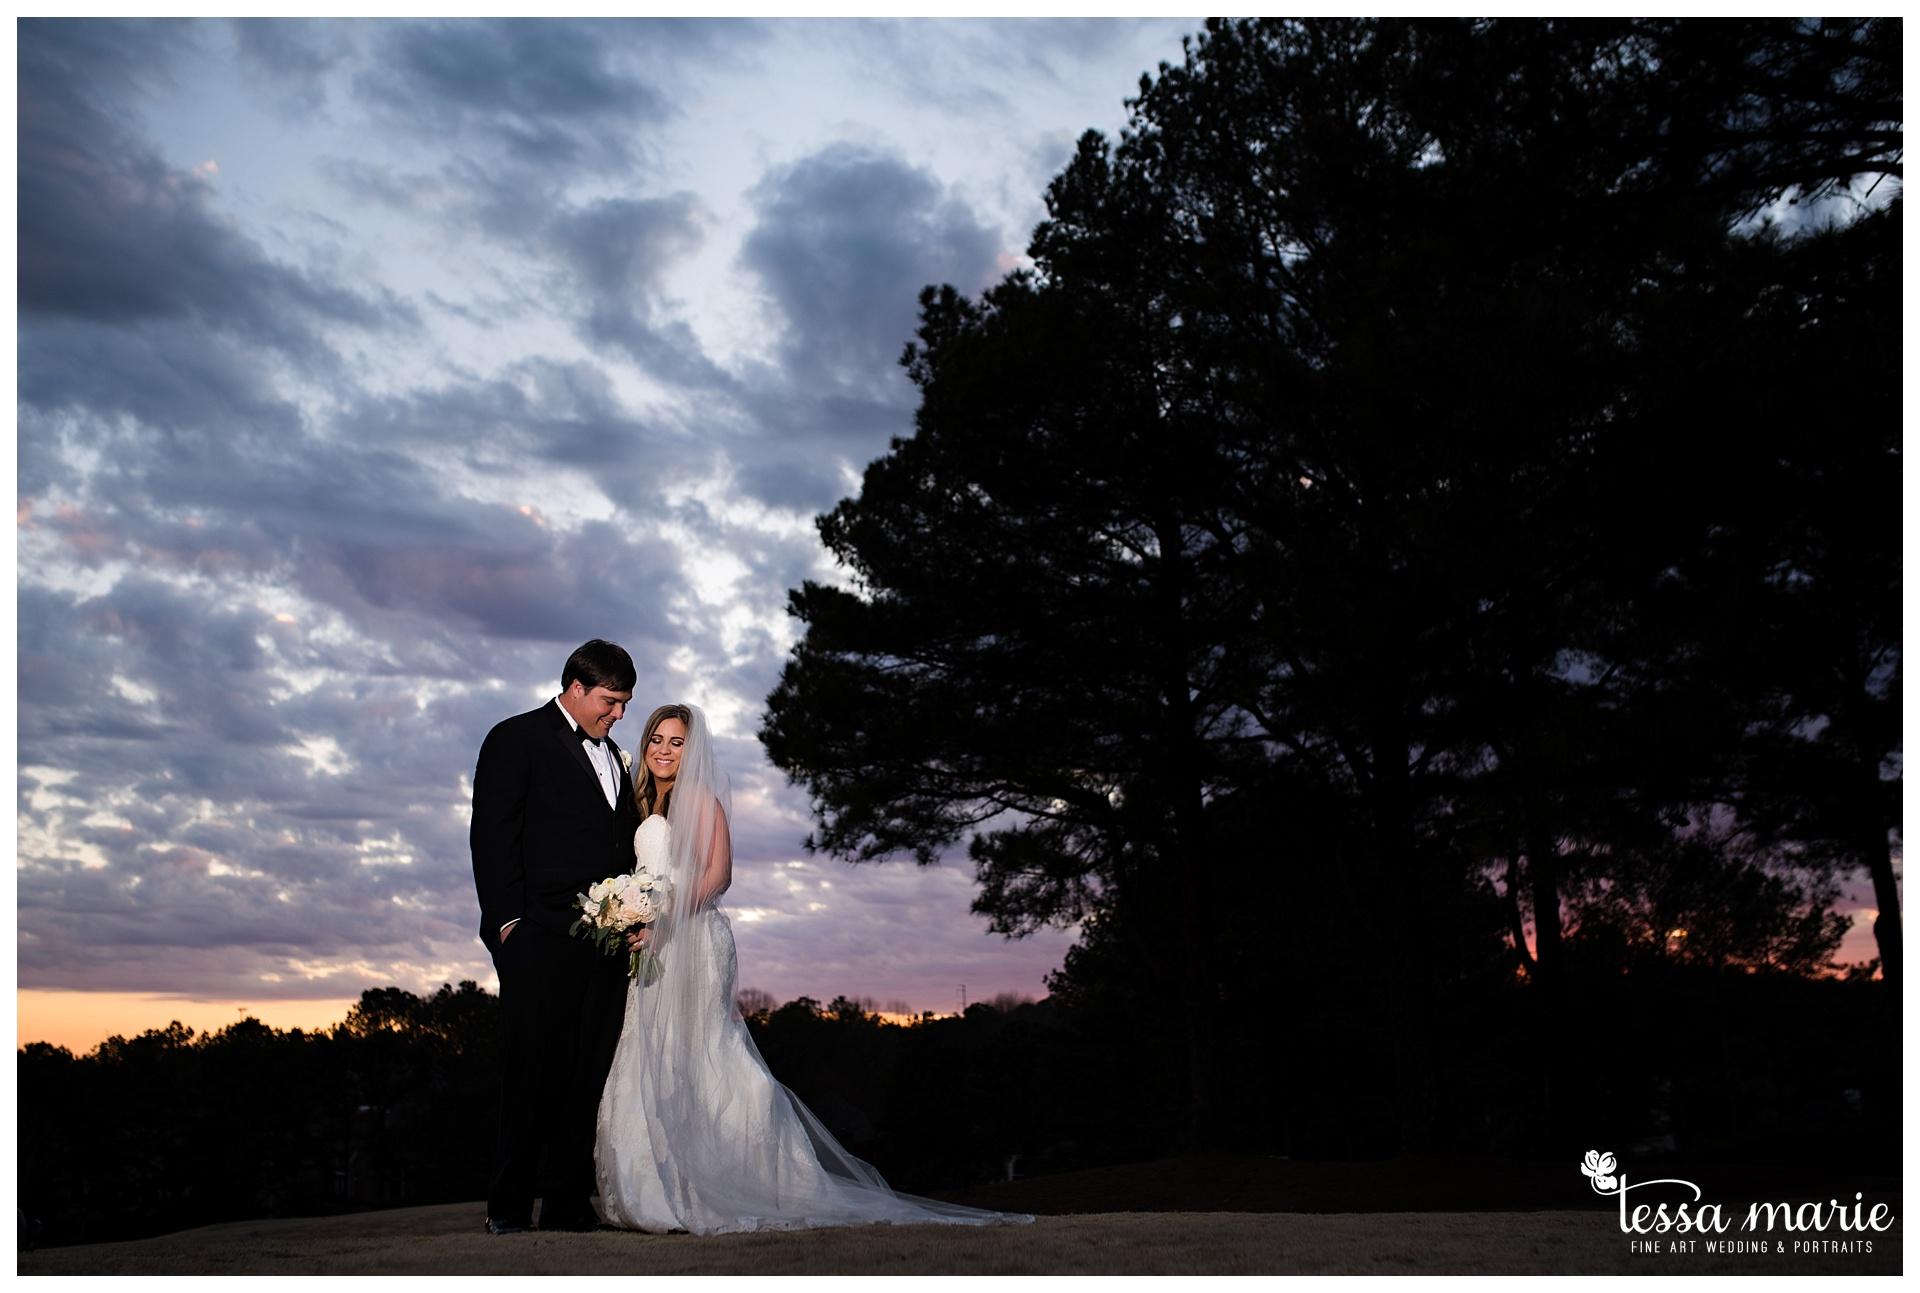 tessa_marie_weddings_legacy_story_focused_wedding_pictures_atlanta_wedding_photographer_0135